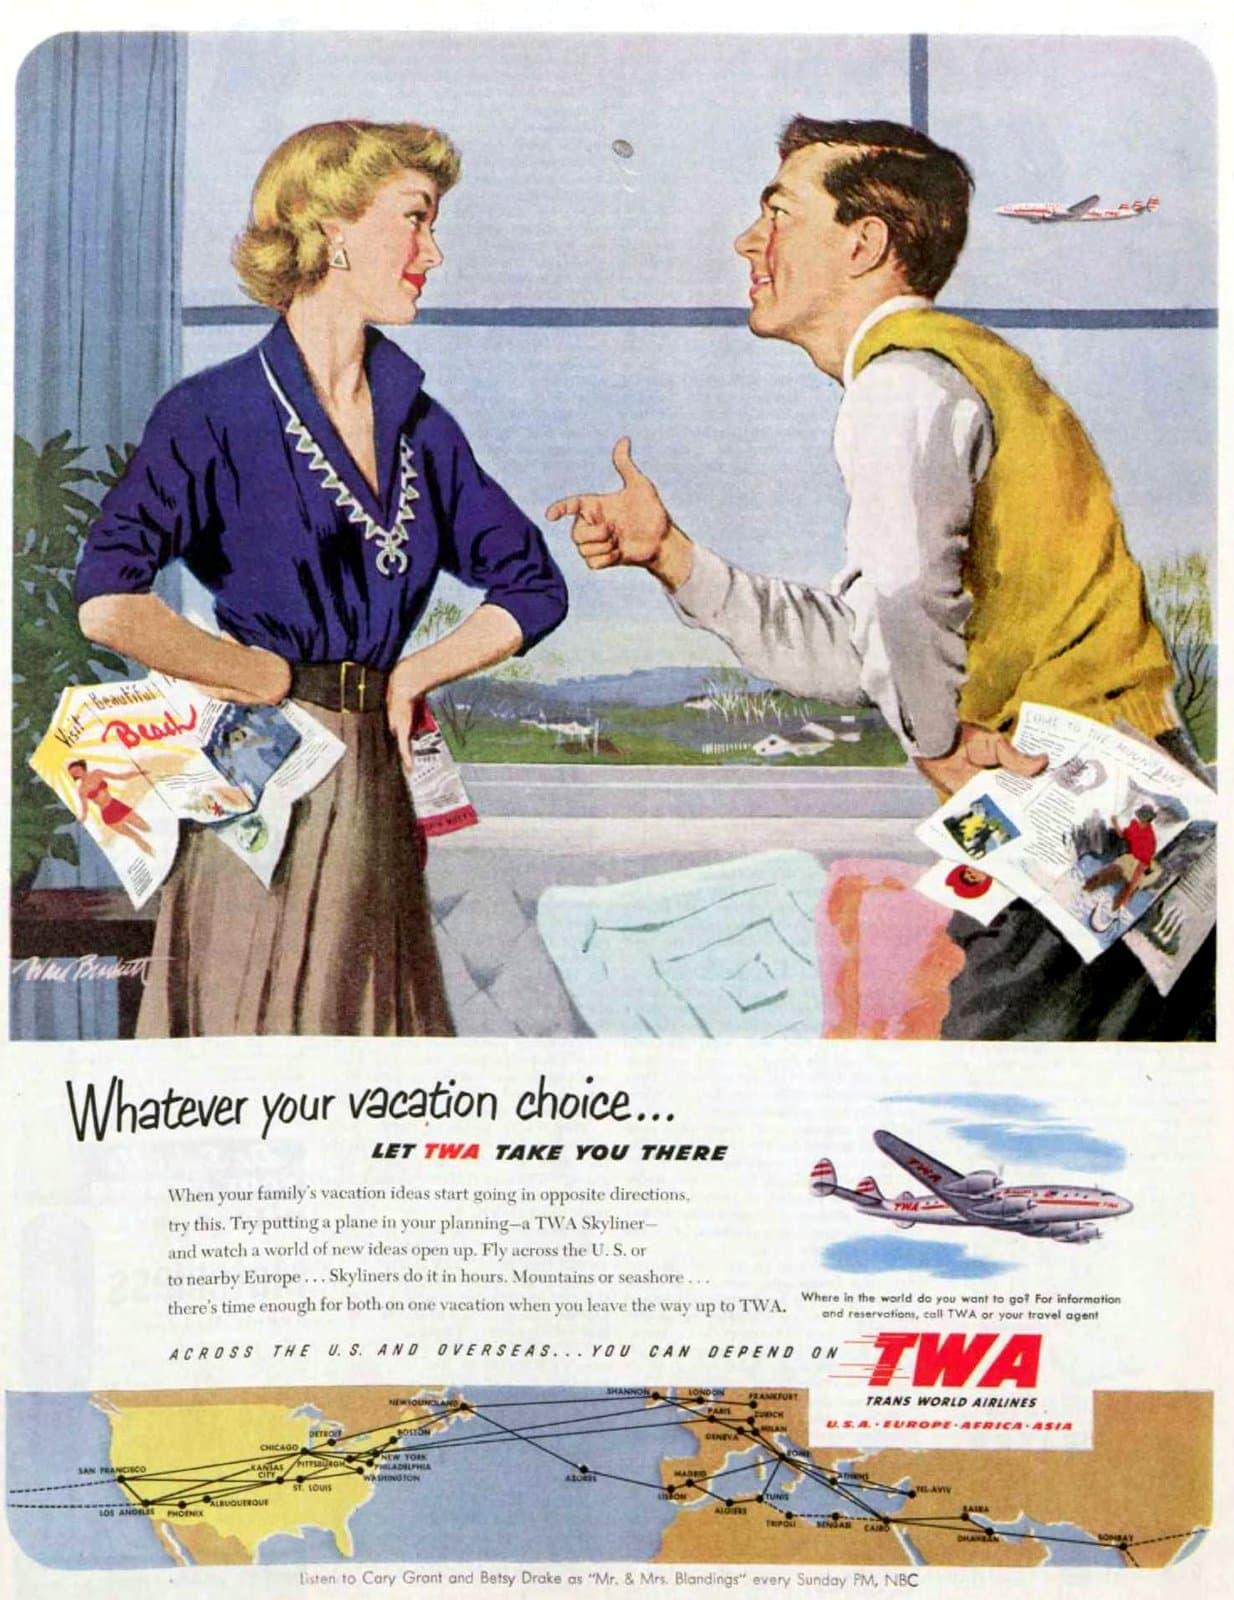 TWA vacations - travel (1951)